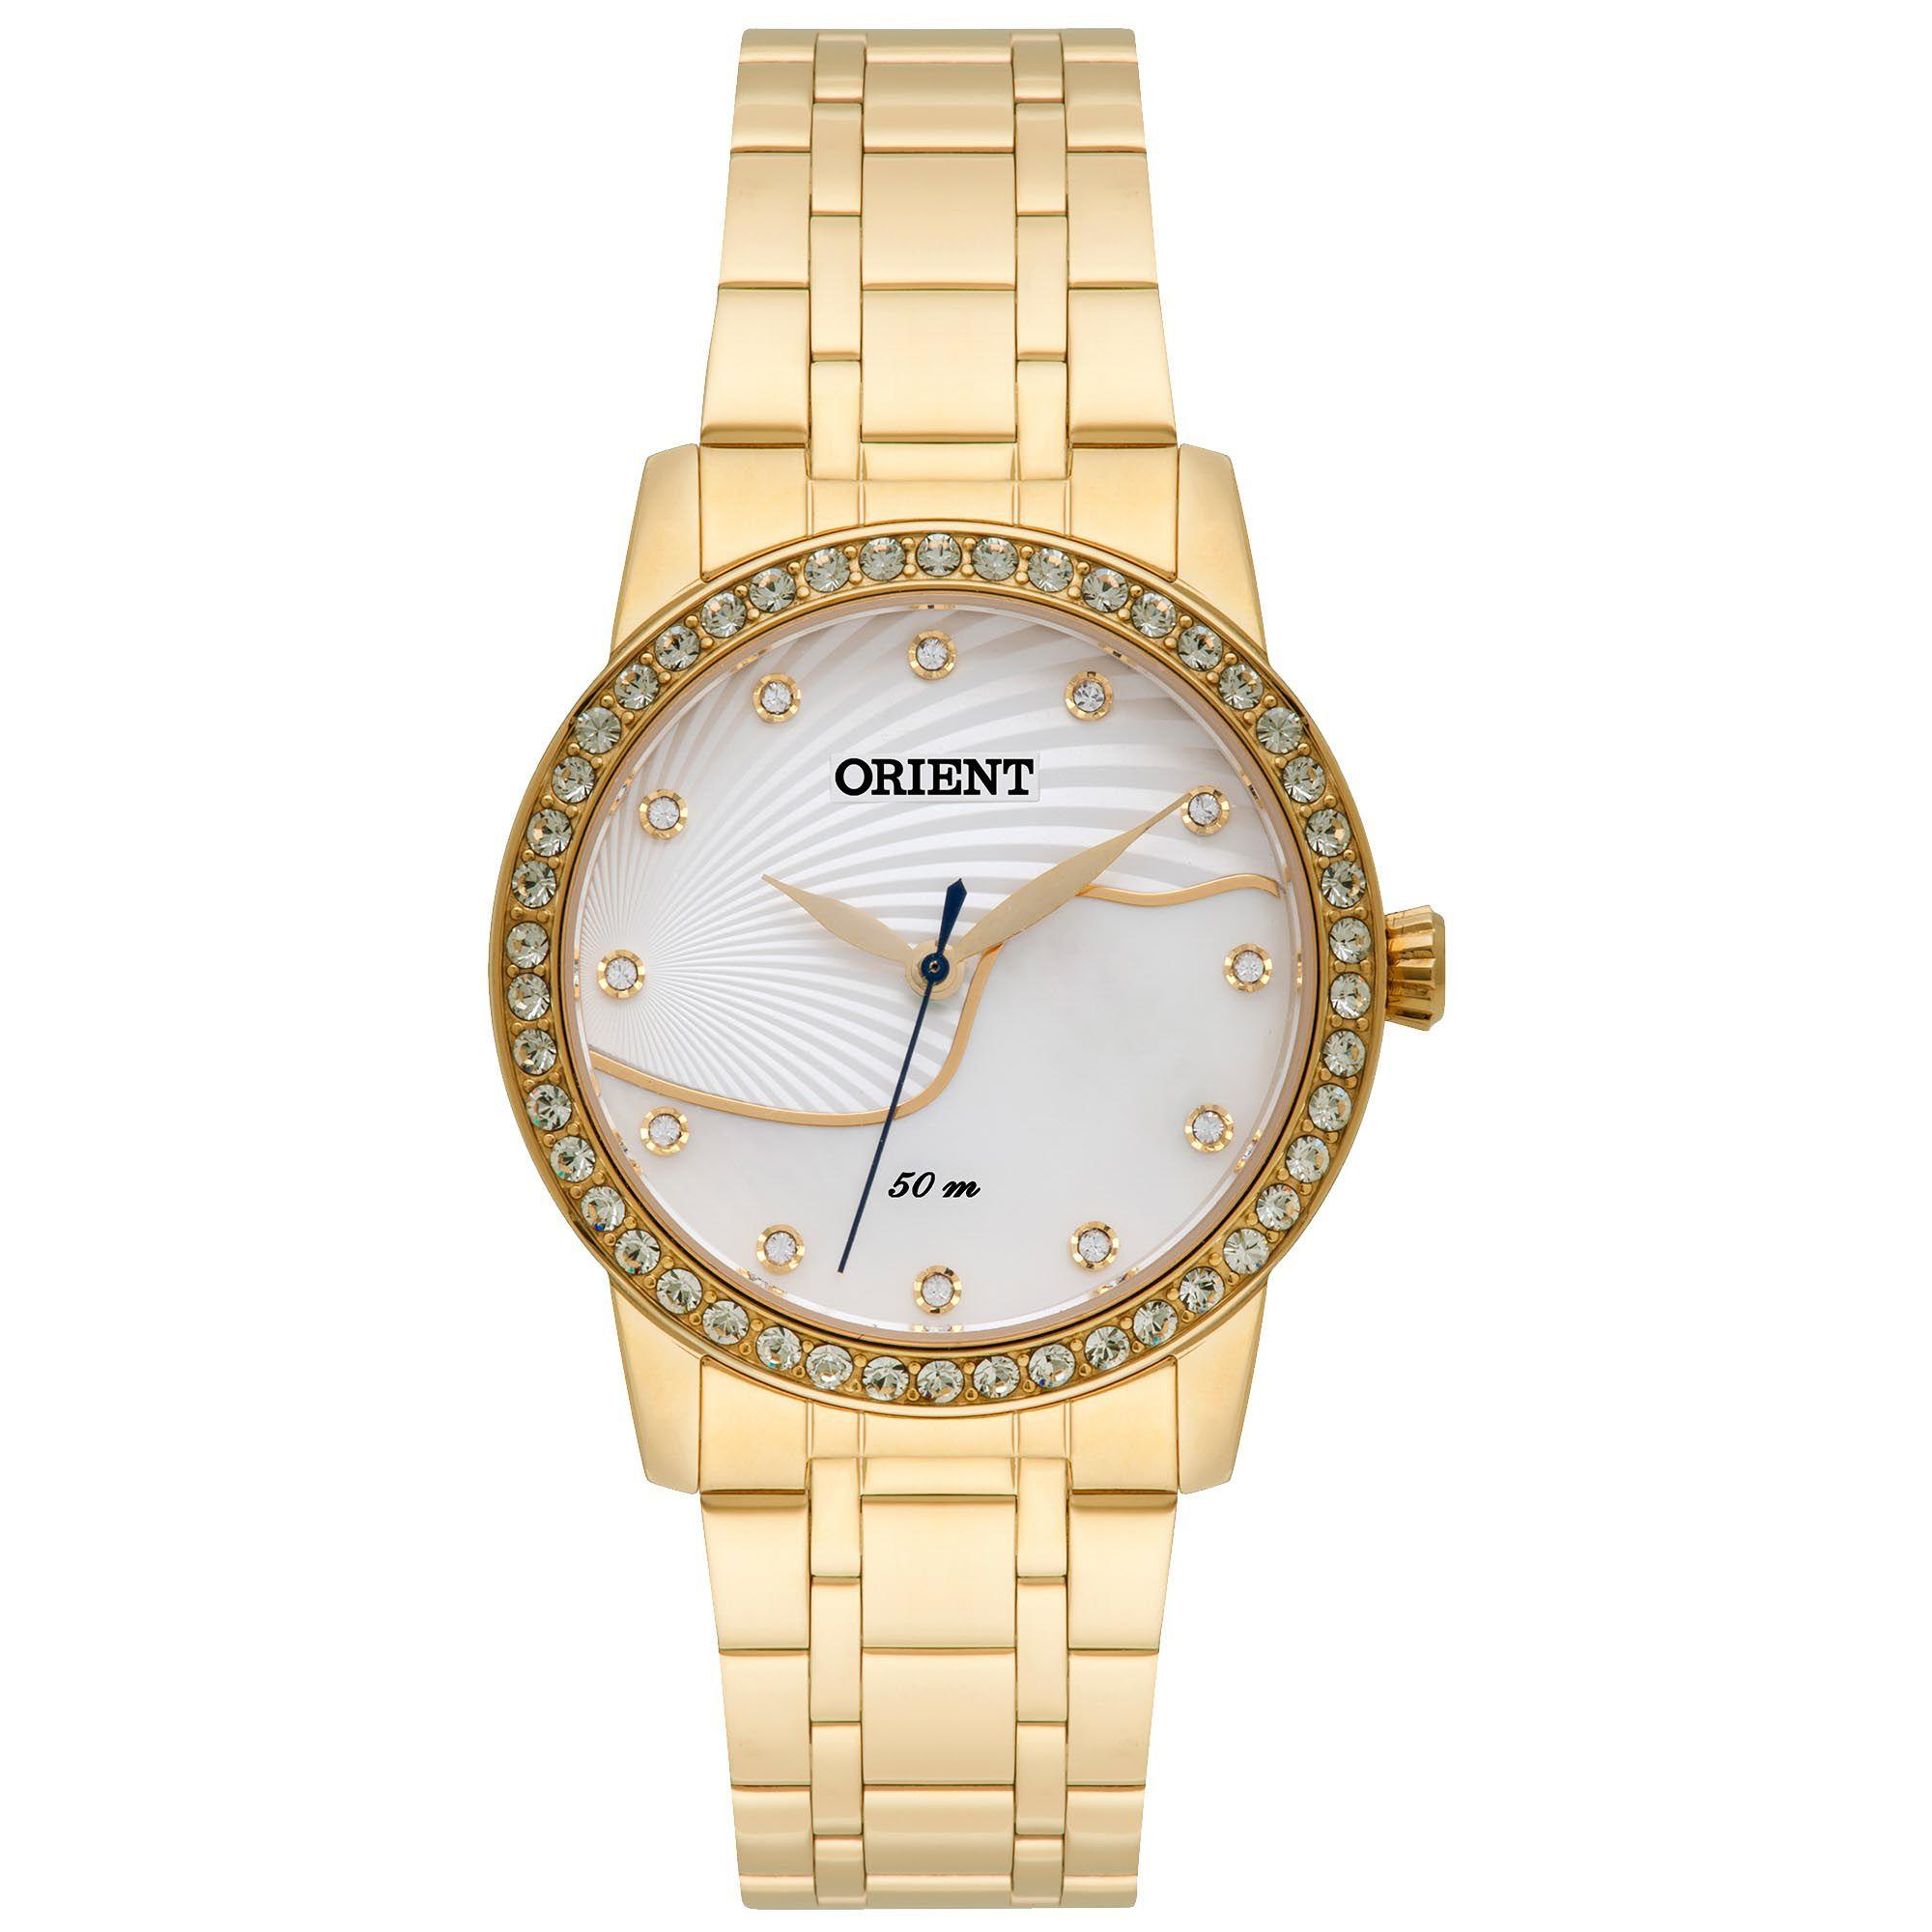 Relógio Feminino Orient FGSS0085 B1KX